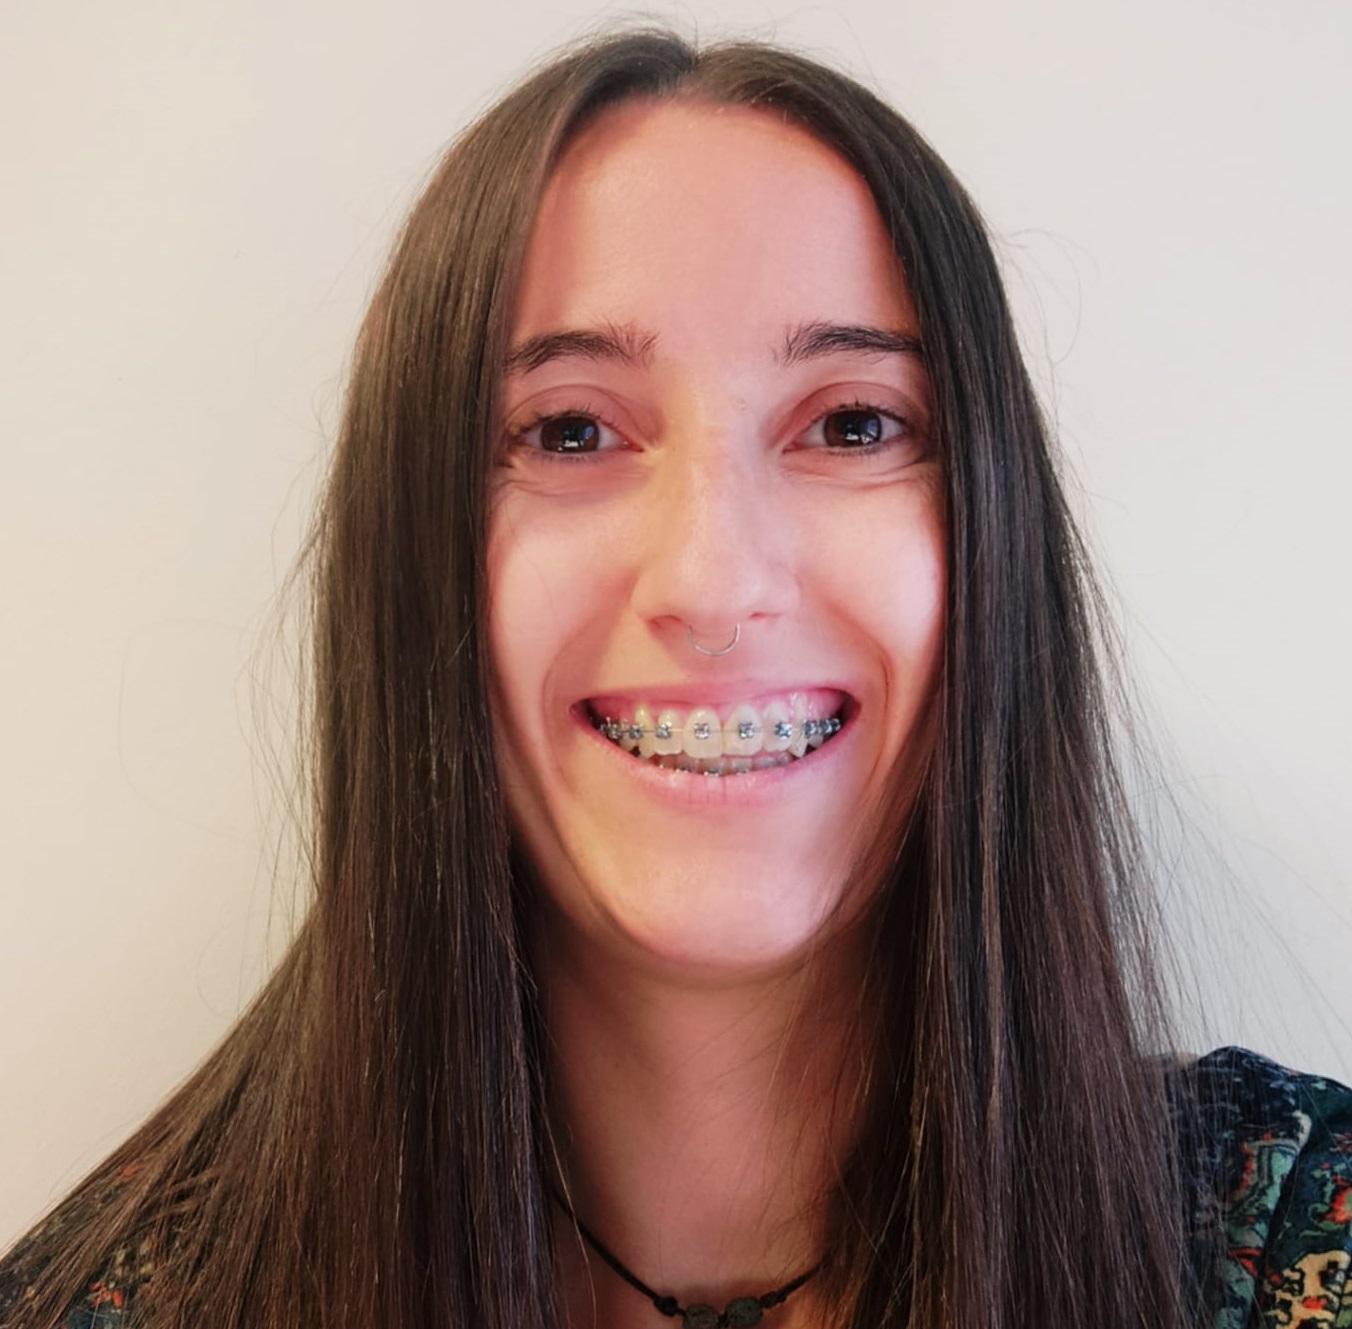 Yolanda Soriano Juan